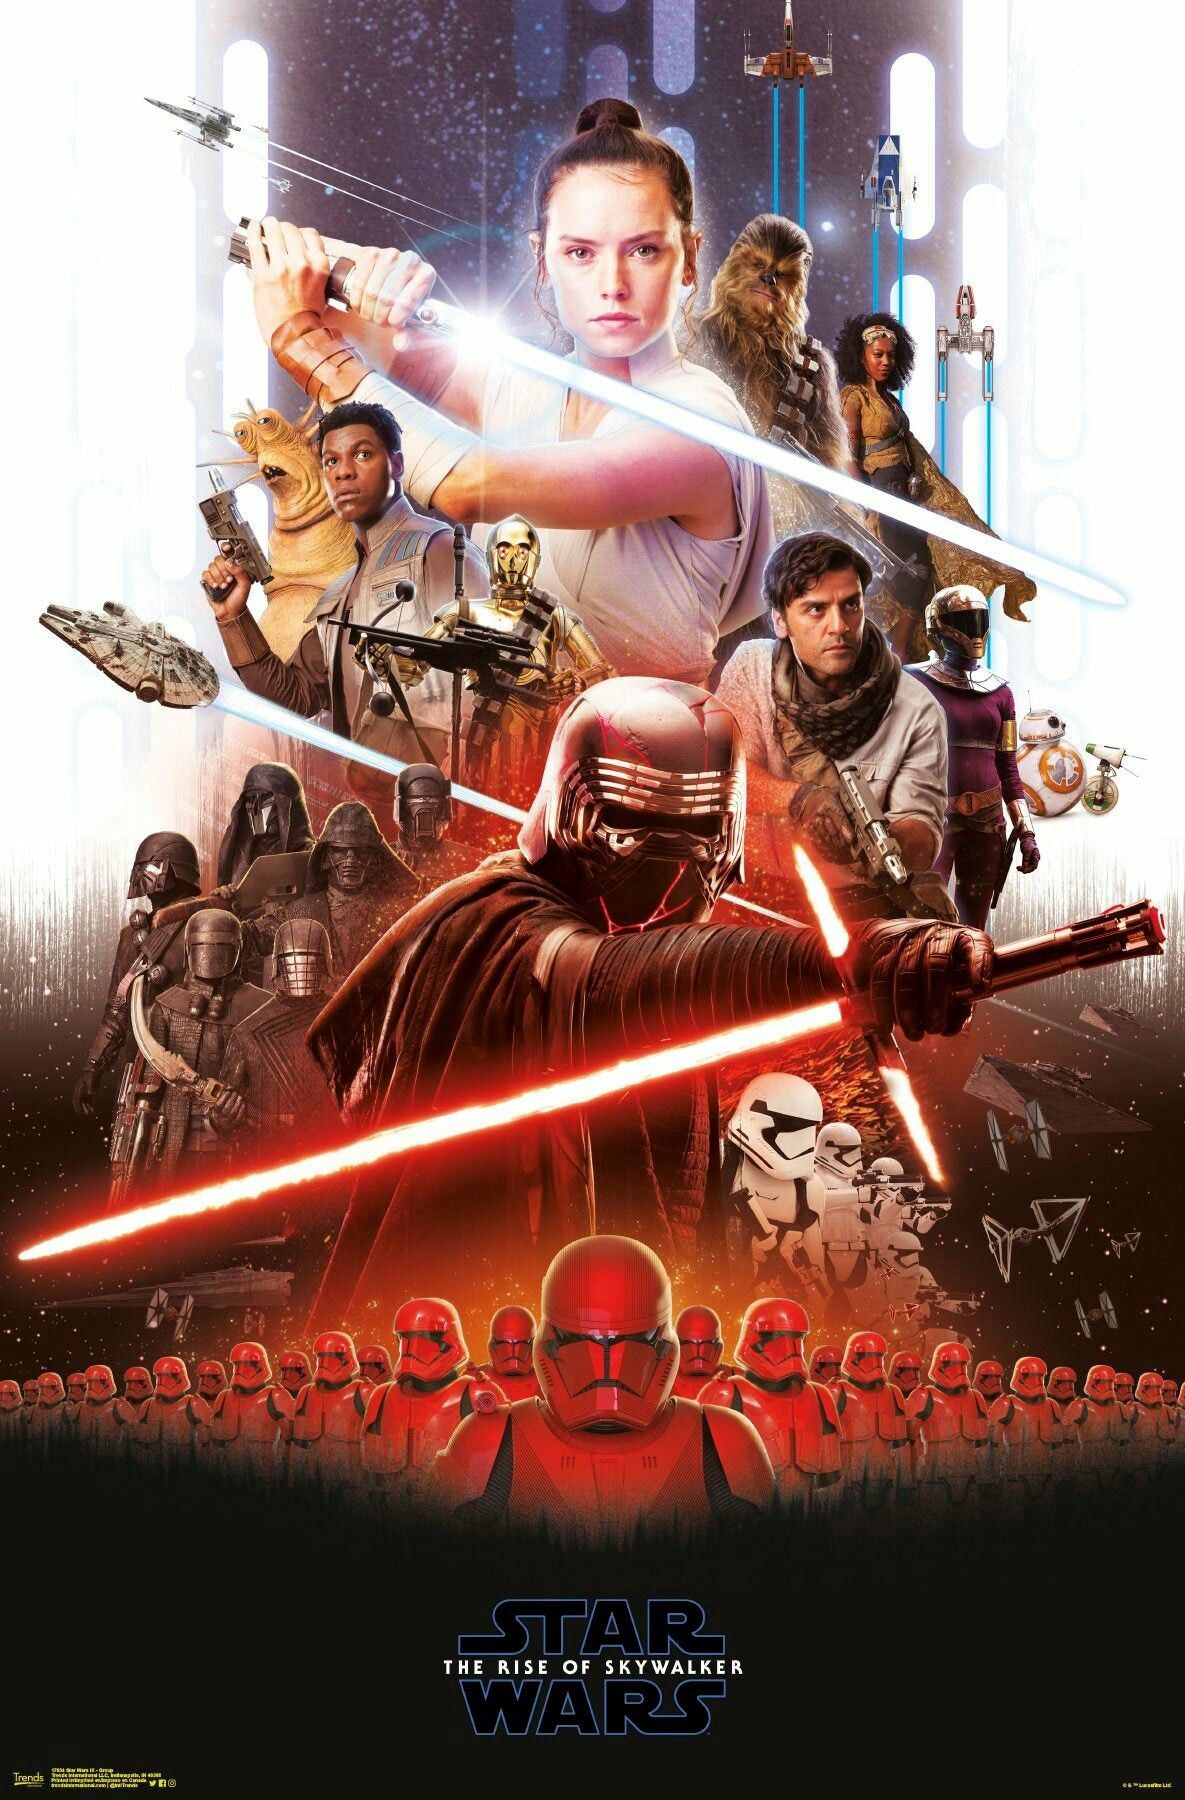 Pin De Playm4ster Em Star Wars Pintura De Star Wars Star Wars Star Wars Meme